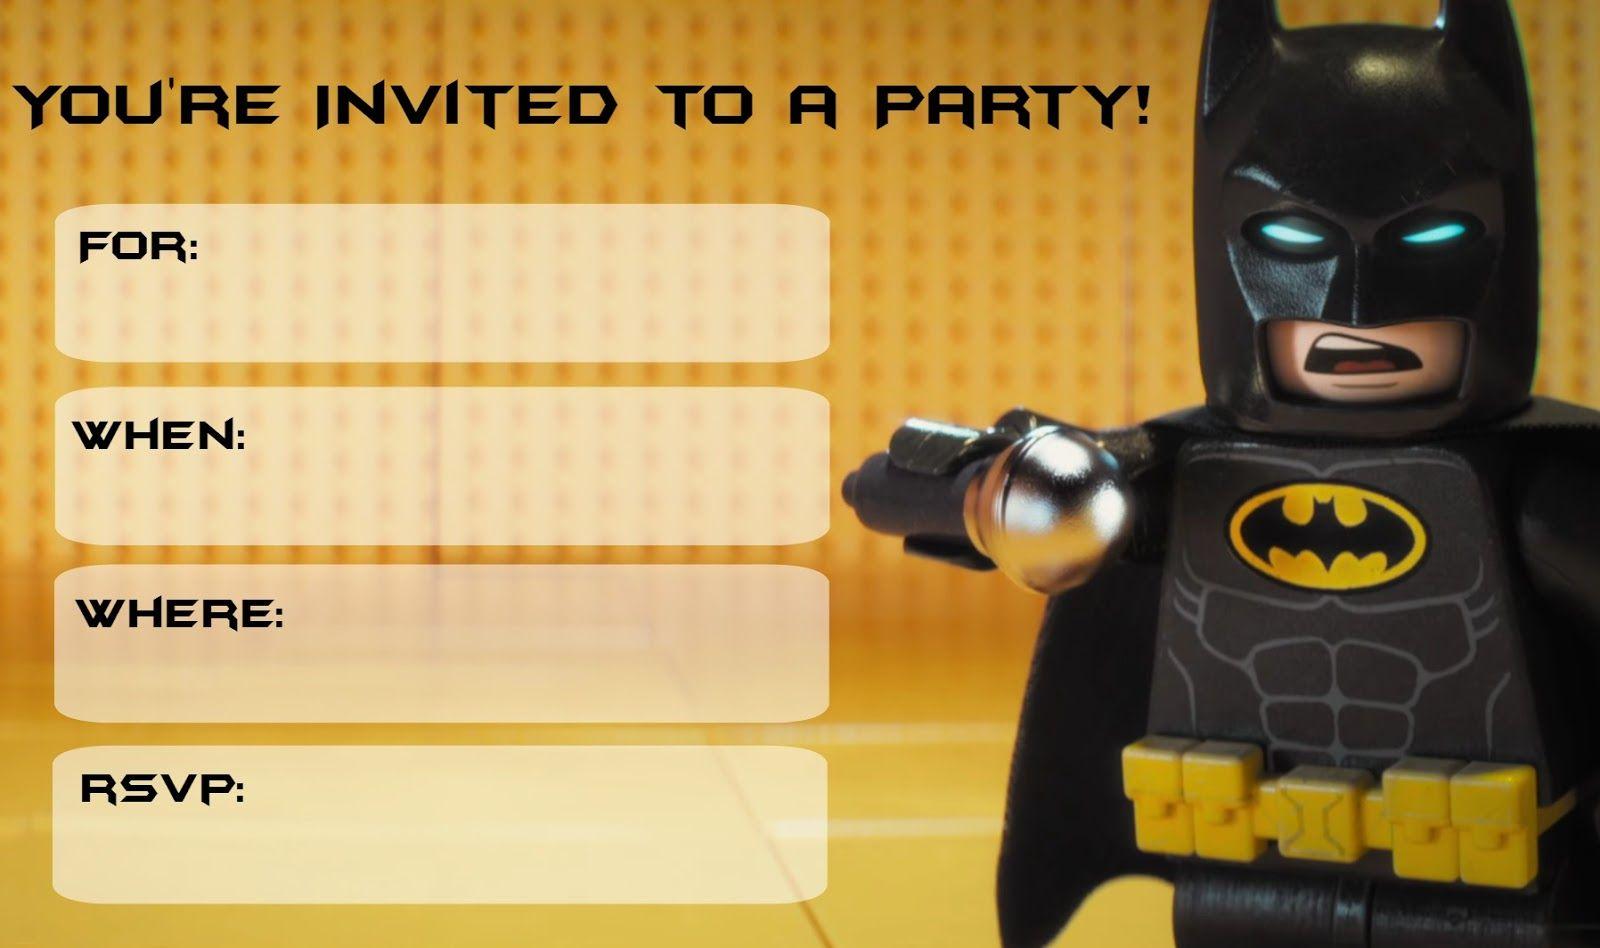 Lego Batman Movie Party Invitations Batman Lego Party